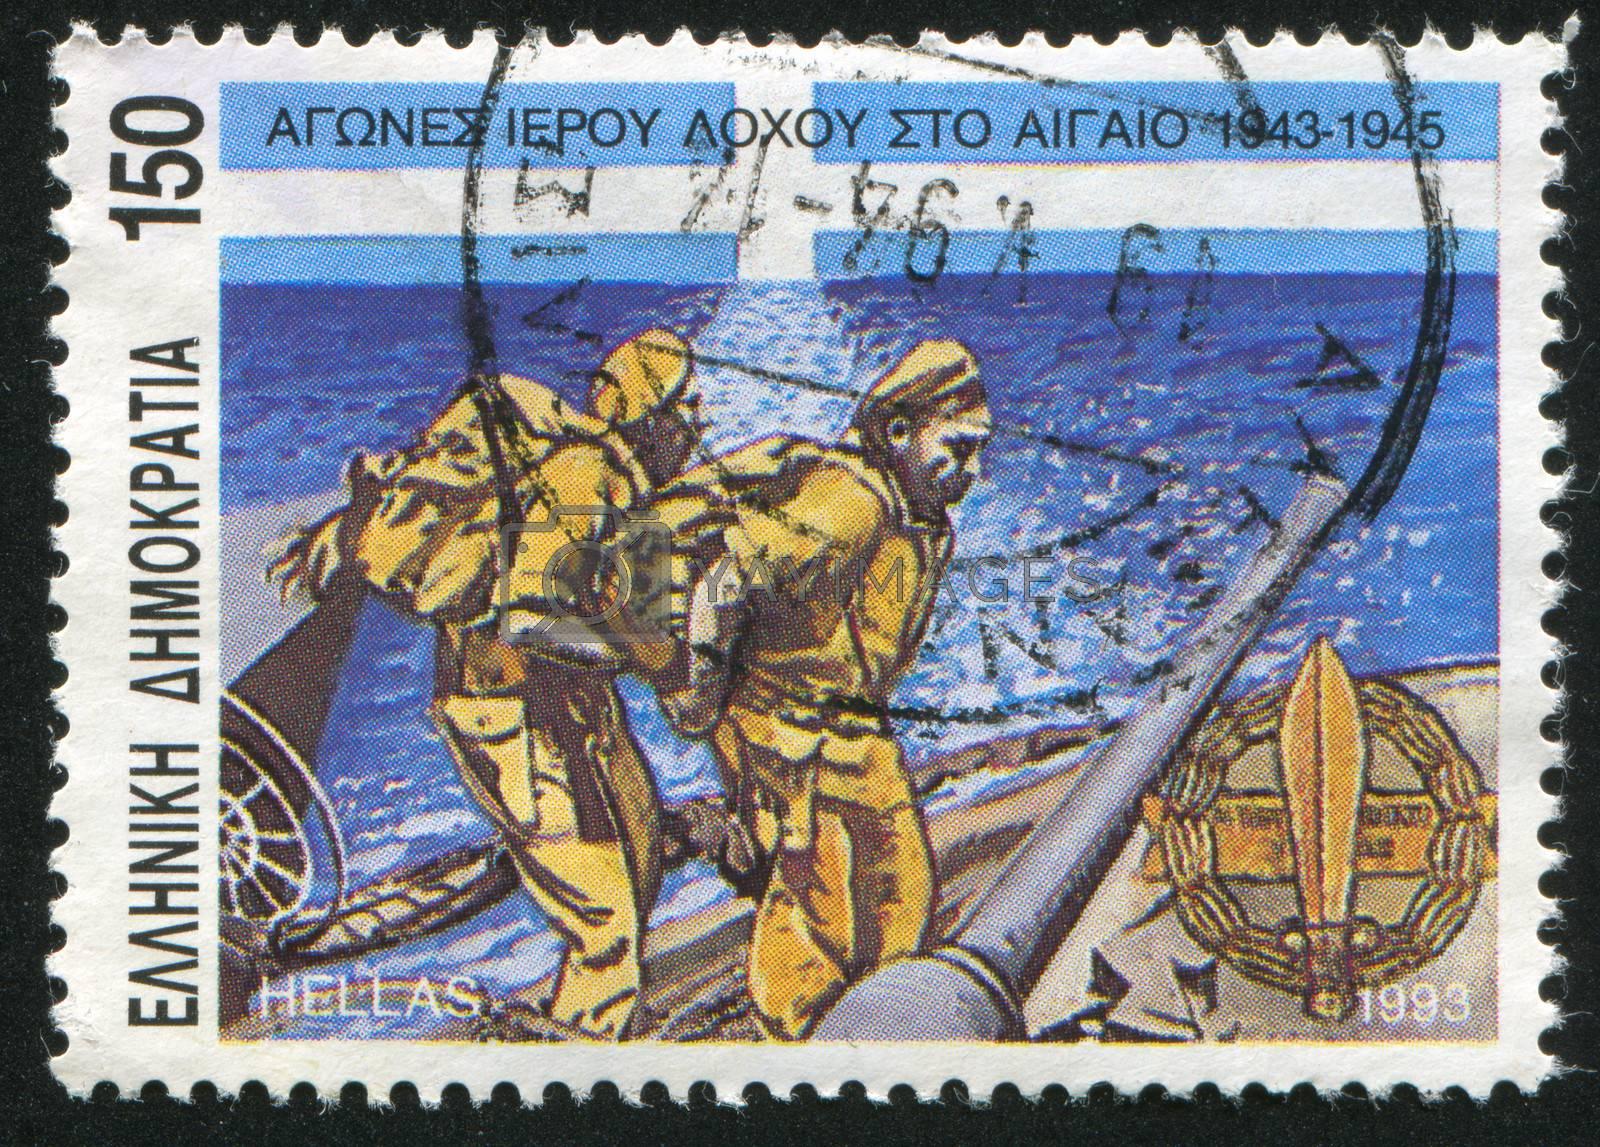 GREECE - CIRCA 1993: stamp printed by Greece, shows Greek troops in Aegan islands, circa 1993